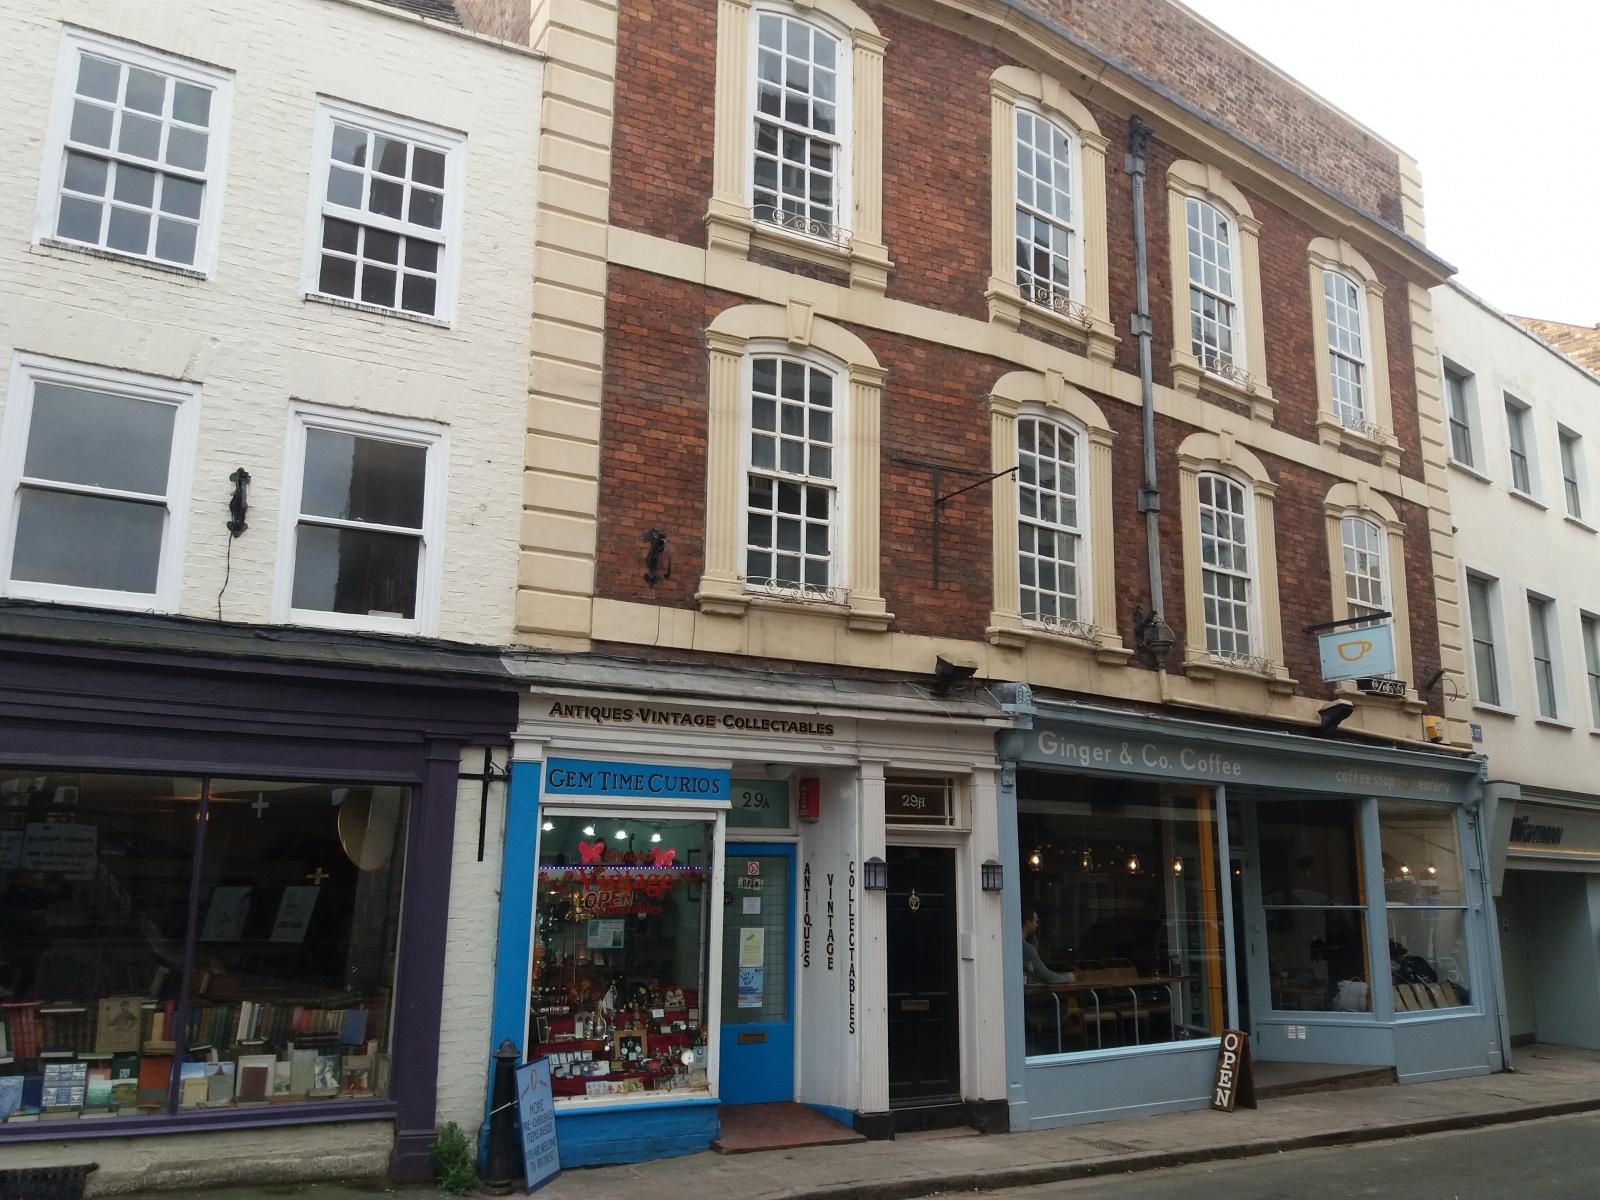 29a - 31 , Princess Street, Shrewsbury, Shropshire